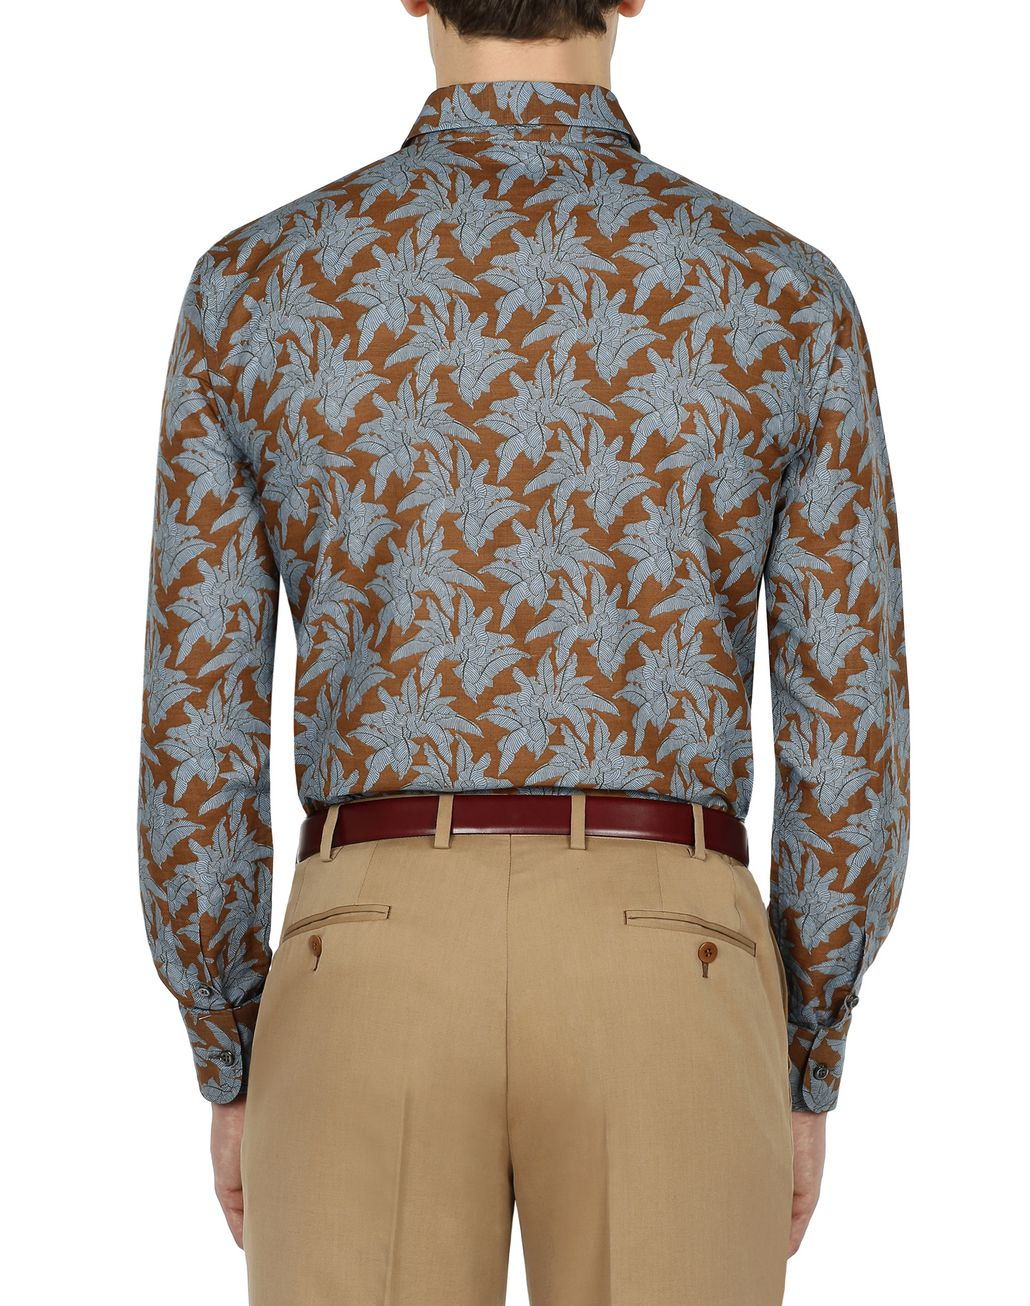 BRIONI Brown Printed Shirt Leisure shirt Man d